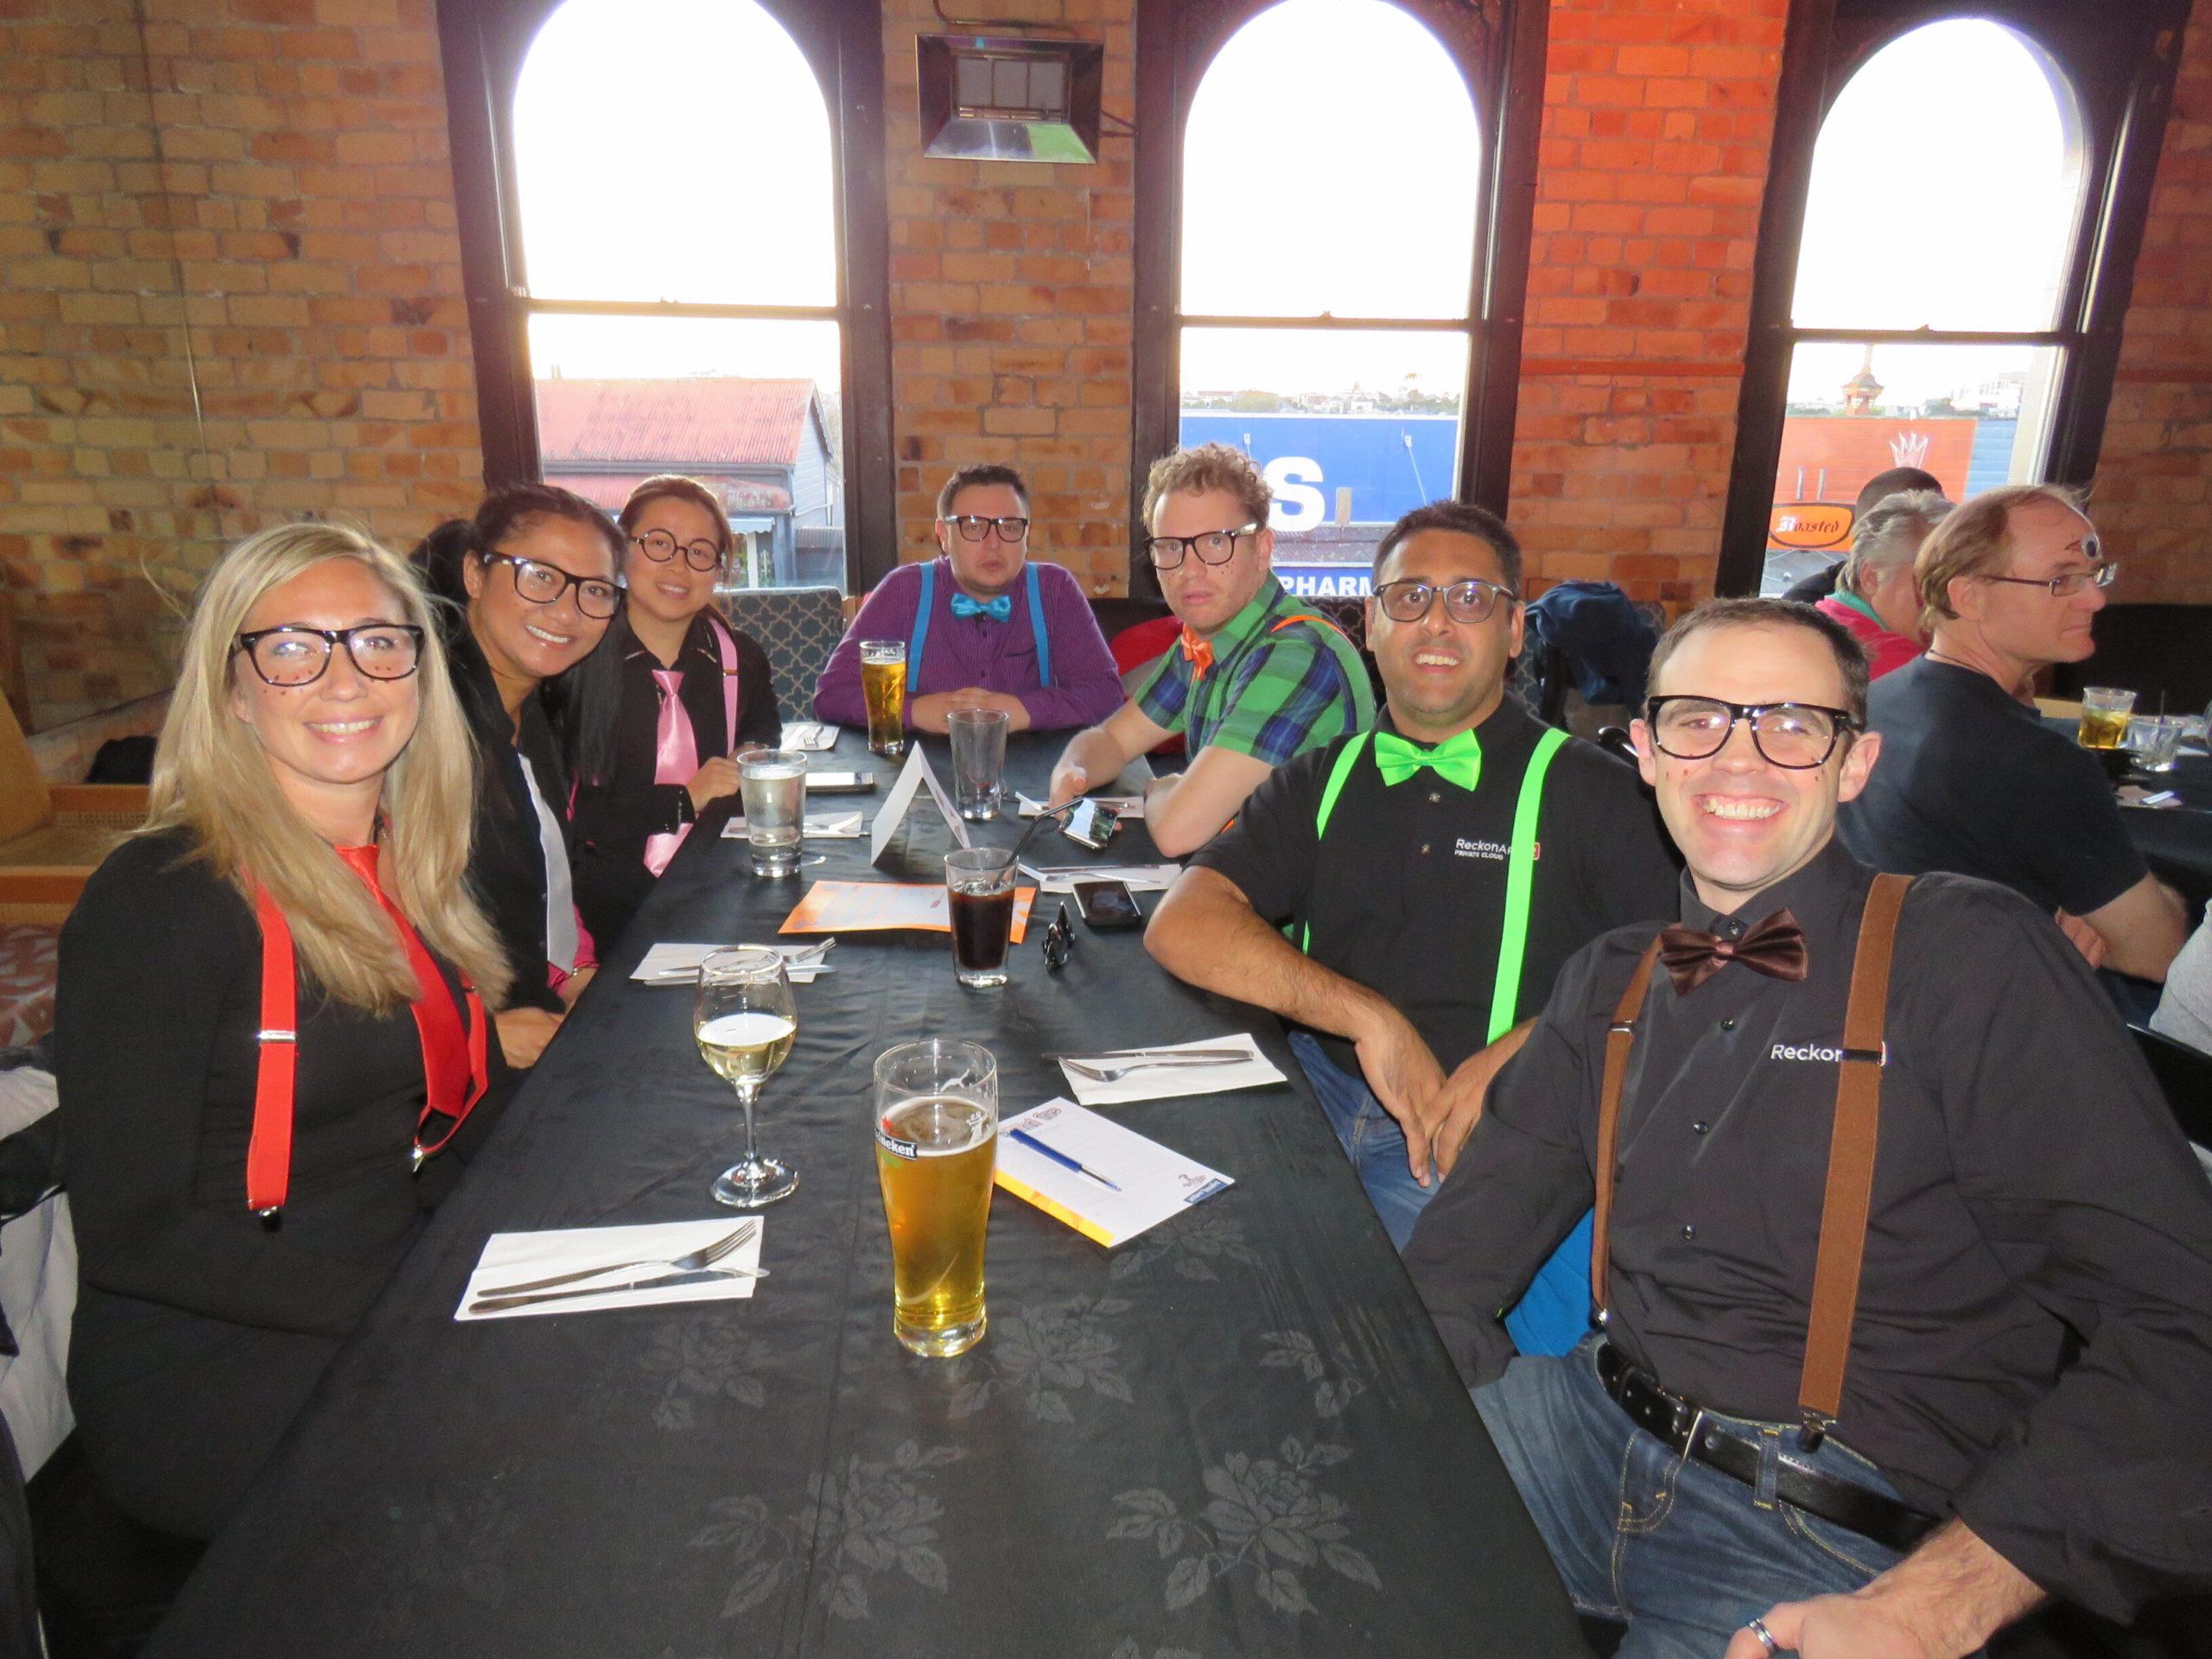 The Reckon NZ team celebrating